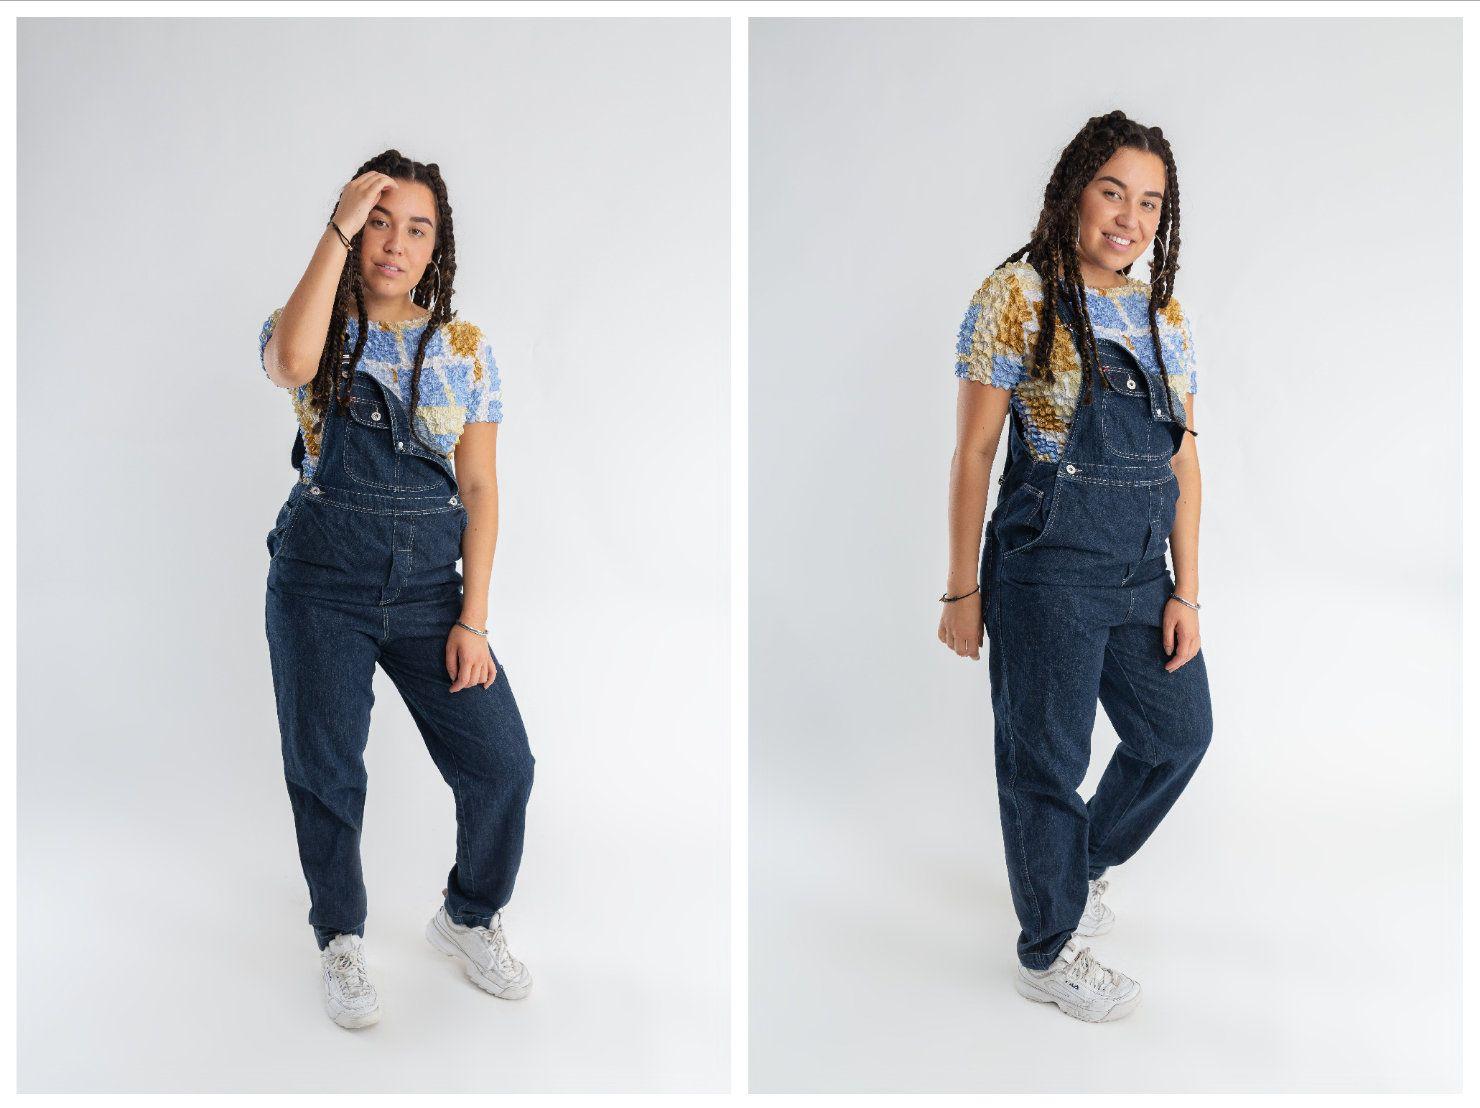 90s Oversized Jeans Dungarees Women S Dark Wash Denim Jumpsuit Men S Long Vintage Denim Overall Rompers Womens Jumpsuit Jumpsuits For Women Jumpsuit Romper